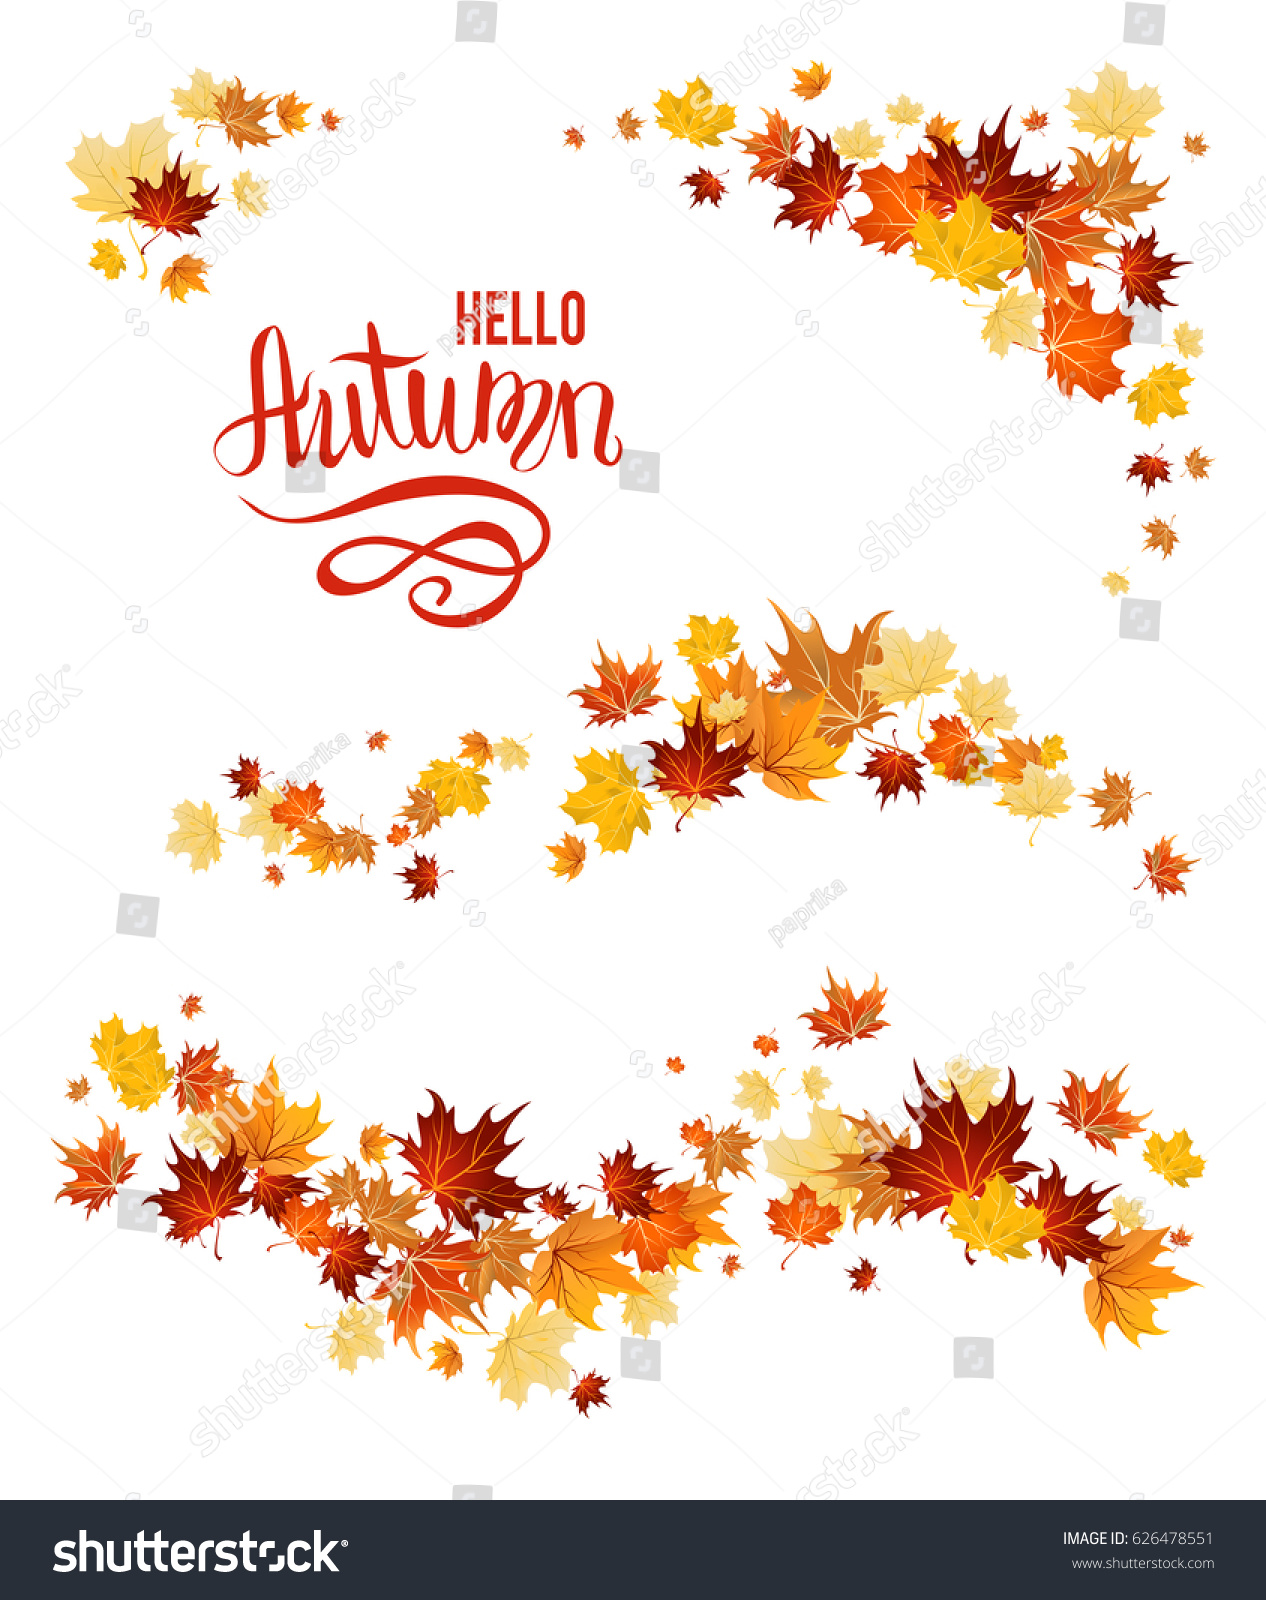 Autumn leaves design elements. Maple fall leaves set.